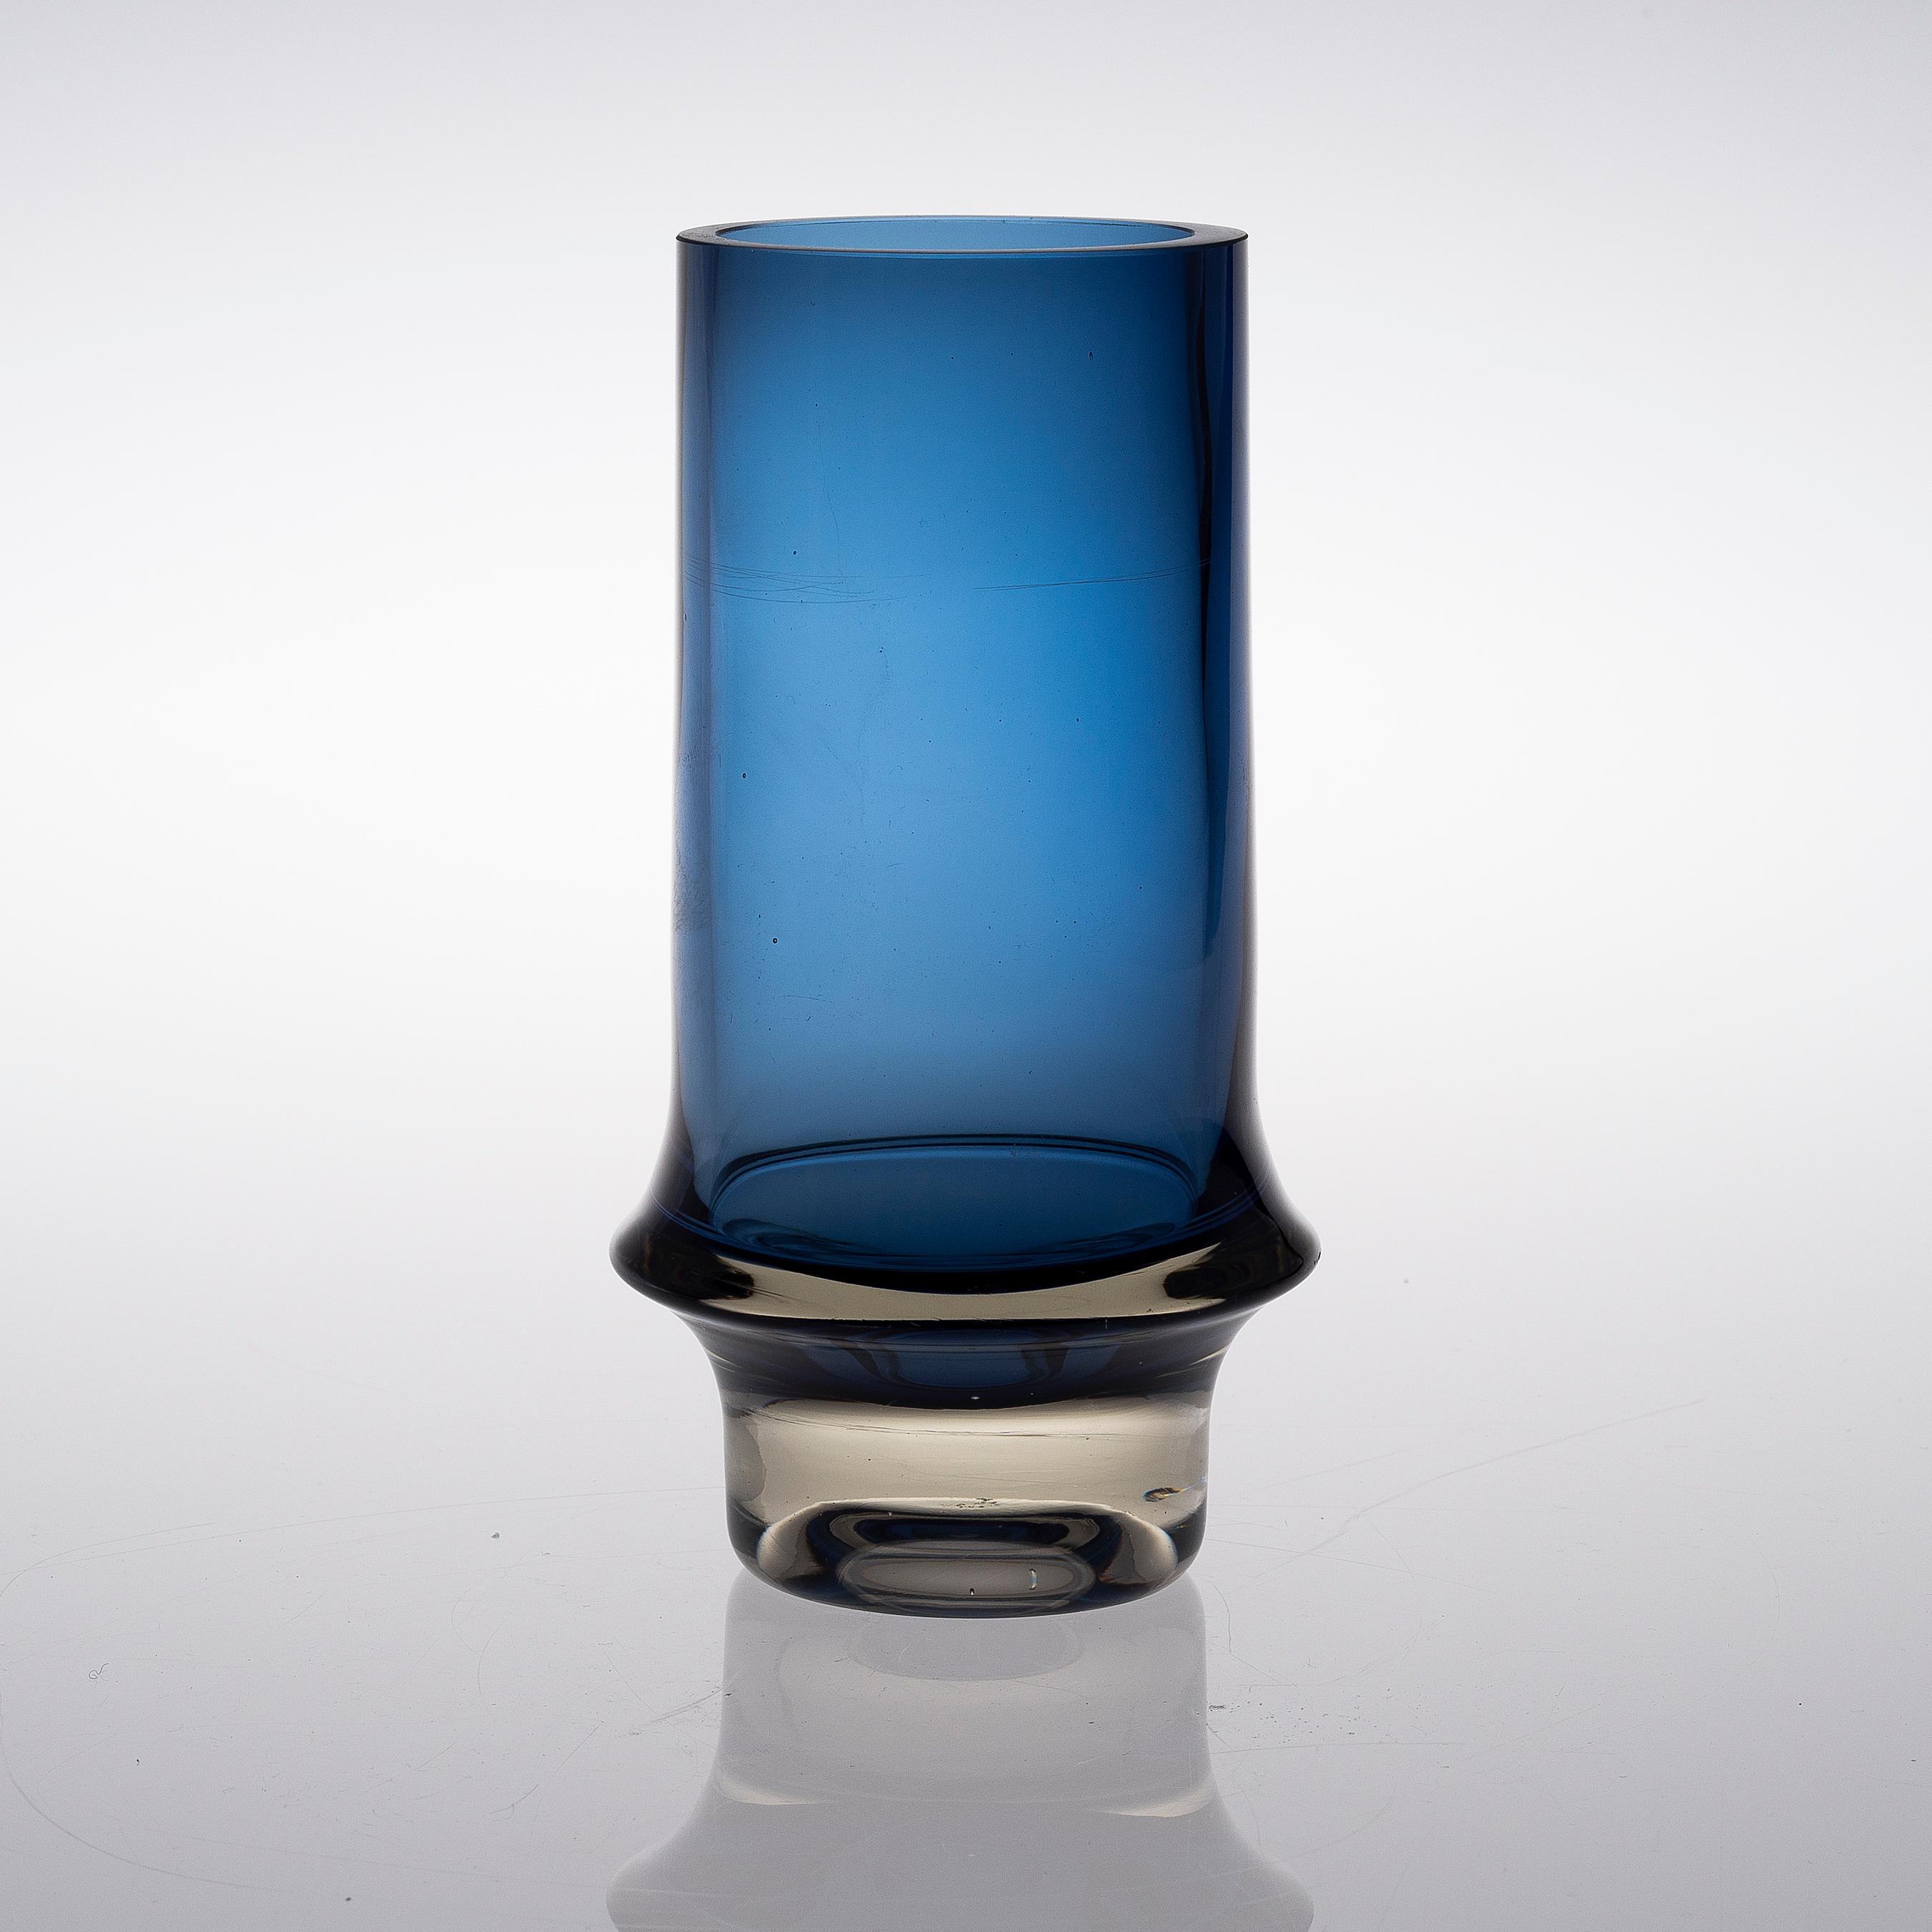 tapio wirkkala vas glas signerad tapio wirkkala 3581 iittala formgiven 1960 bukowskis. Black Bedroom Furniture Sets. Home Design Ideas